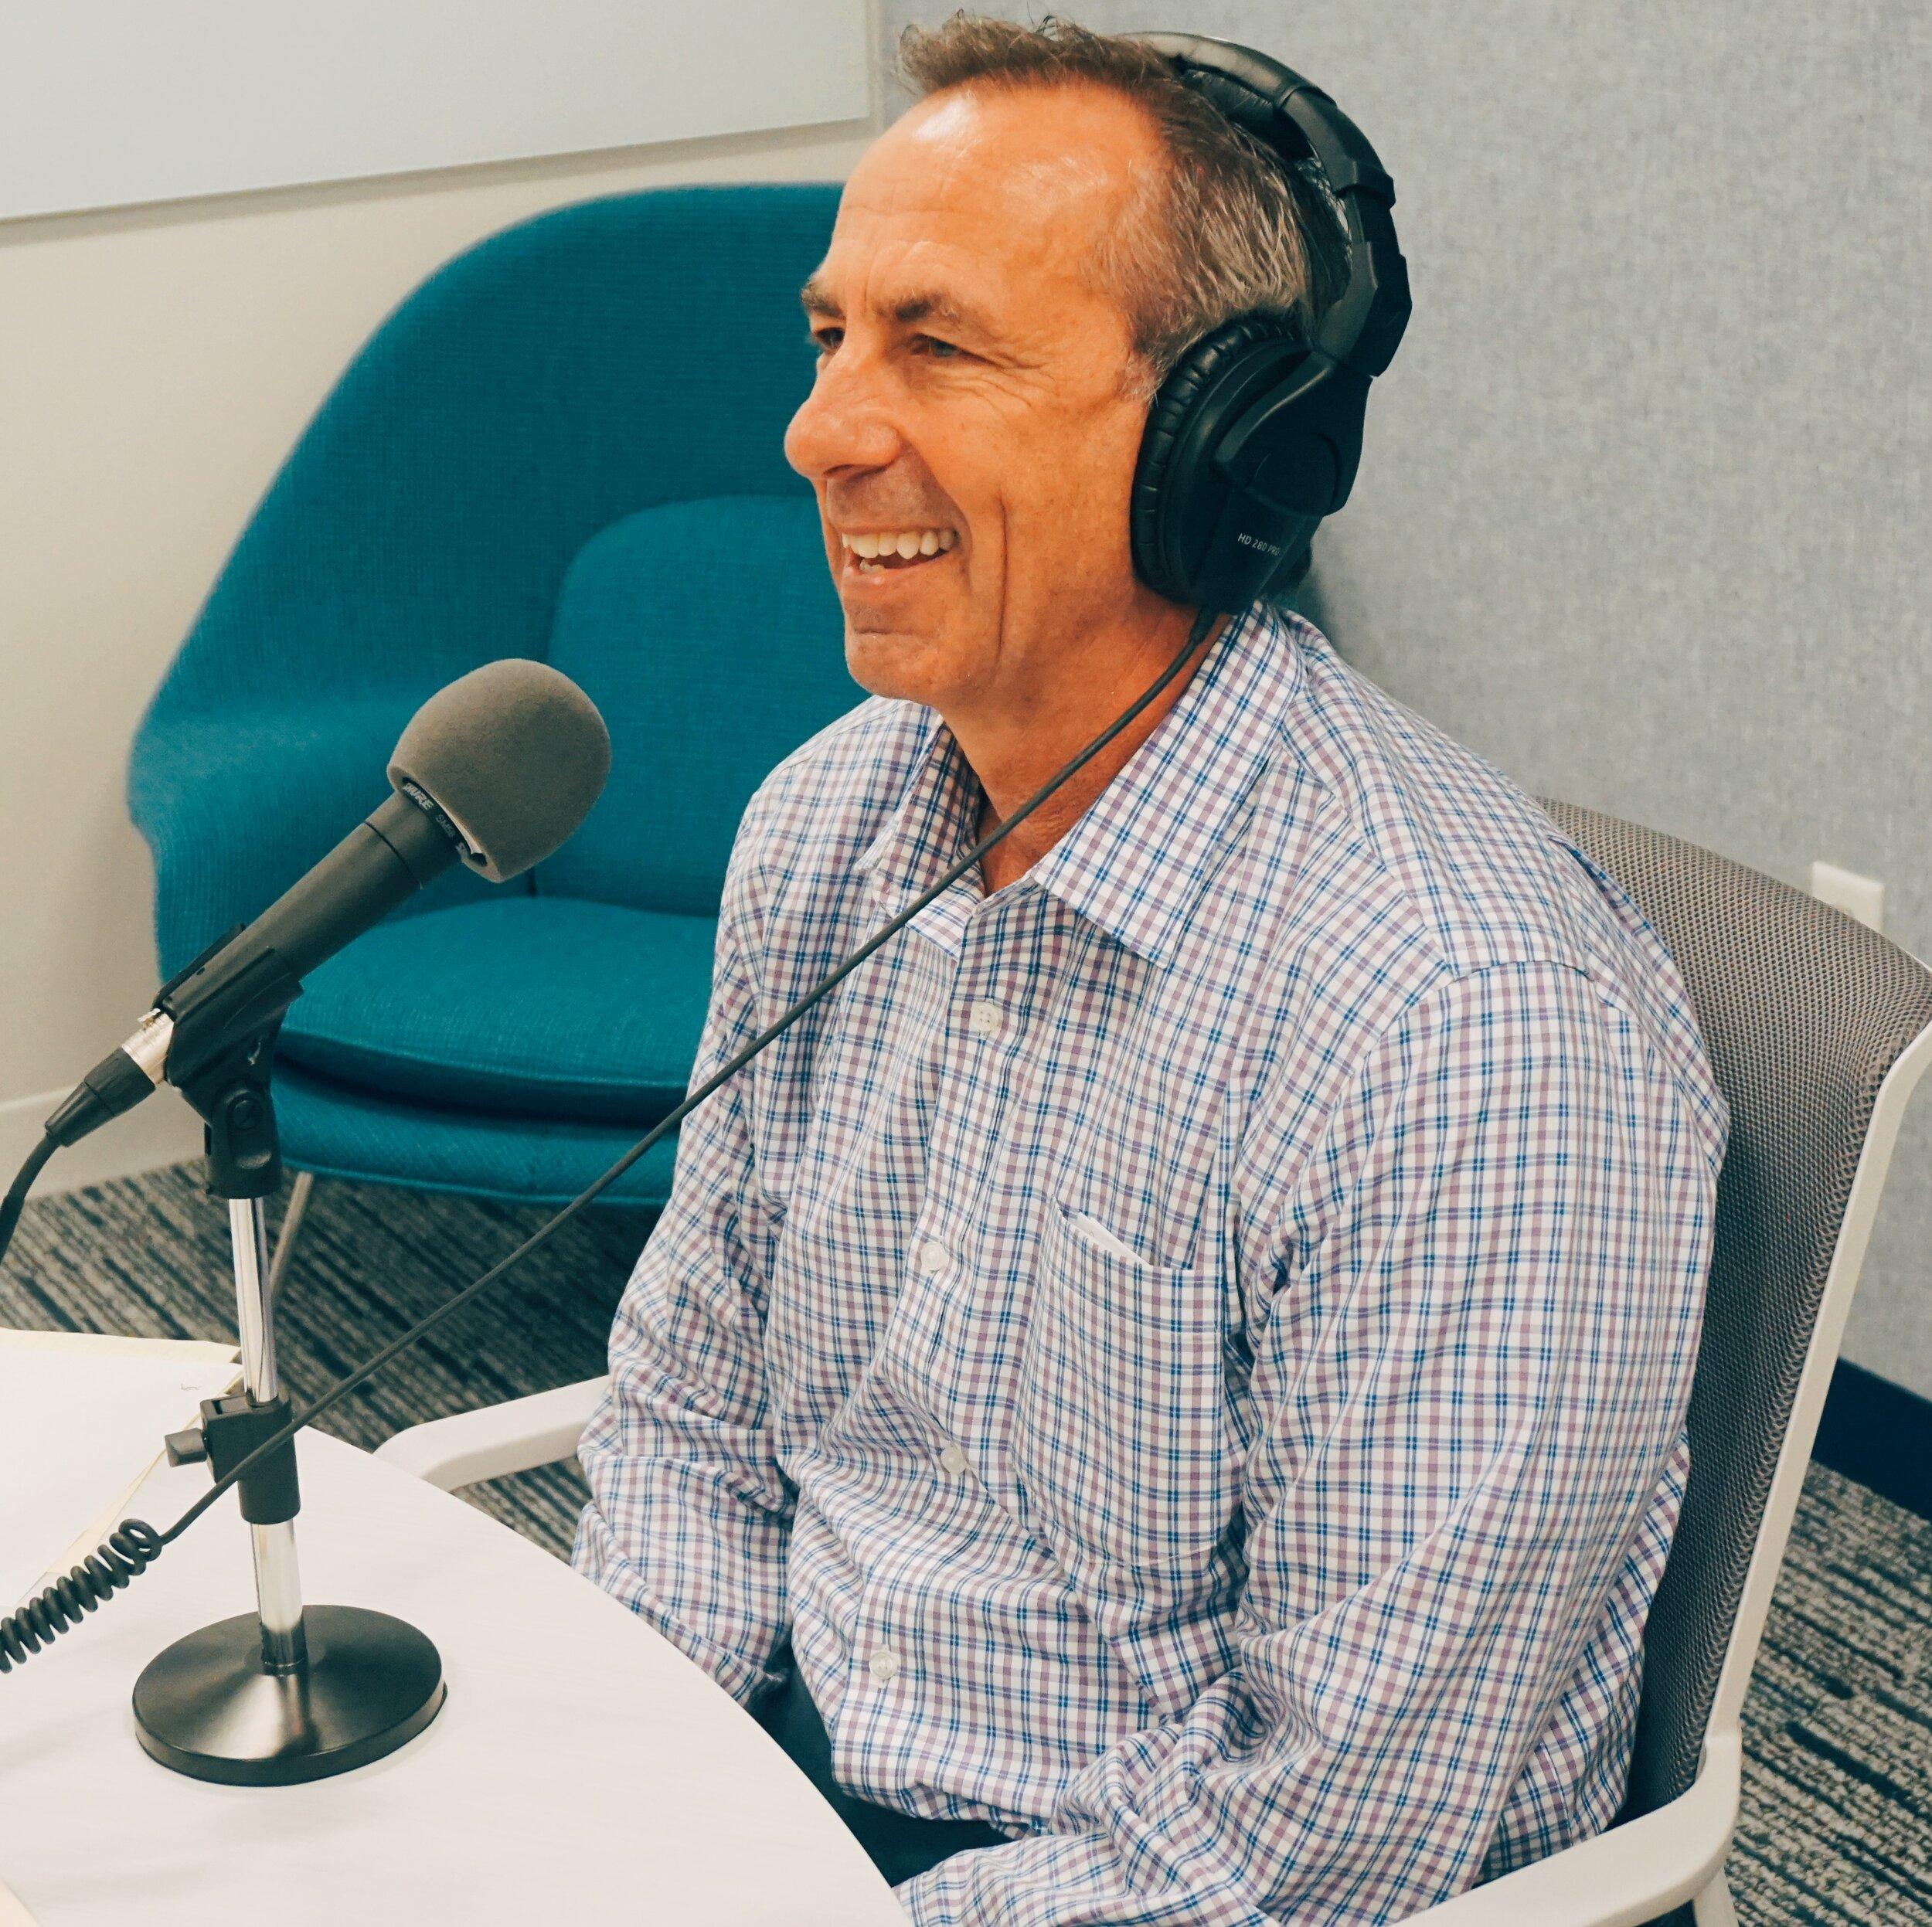 Steve zorn - Pentair Vice President Sales Aquatic & Environmental Systems